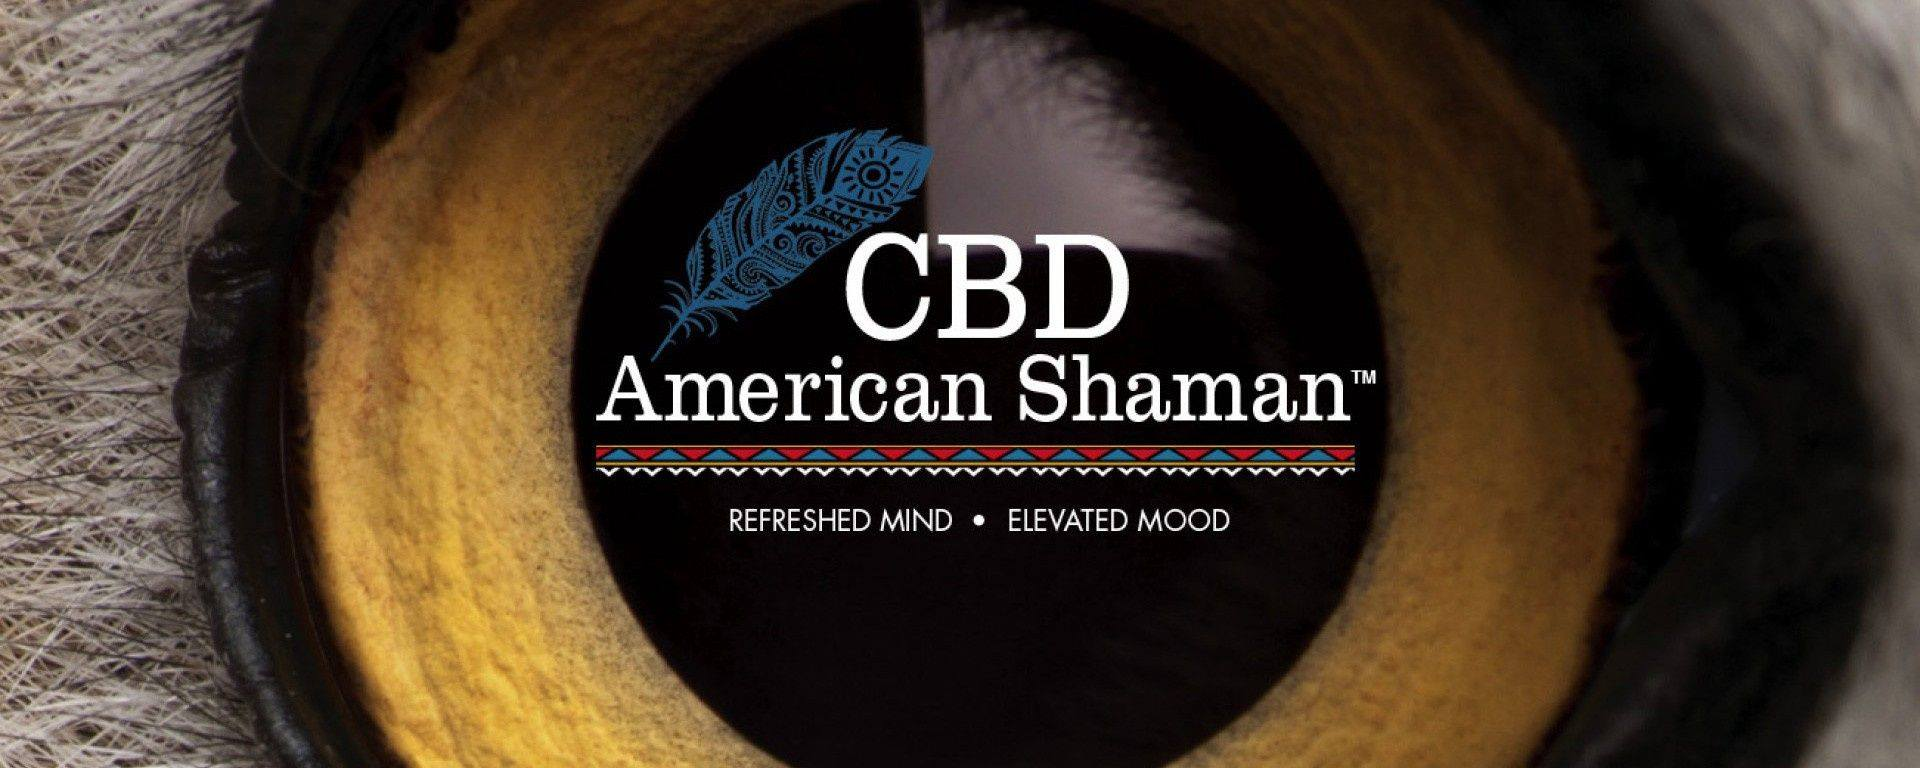 CBD American Shaman Indy Logo